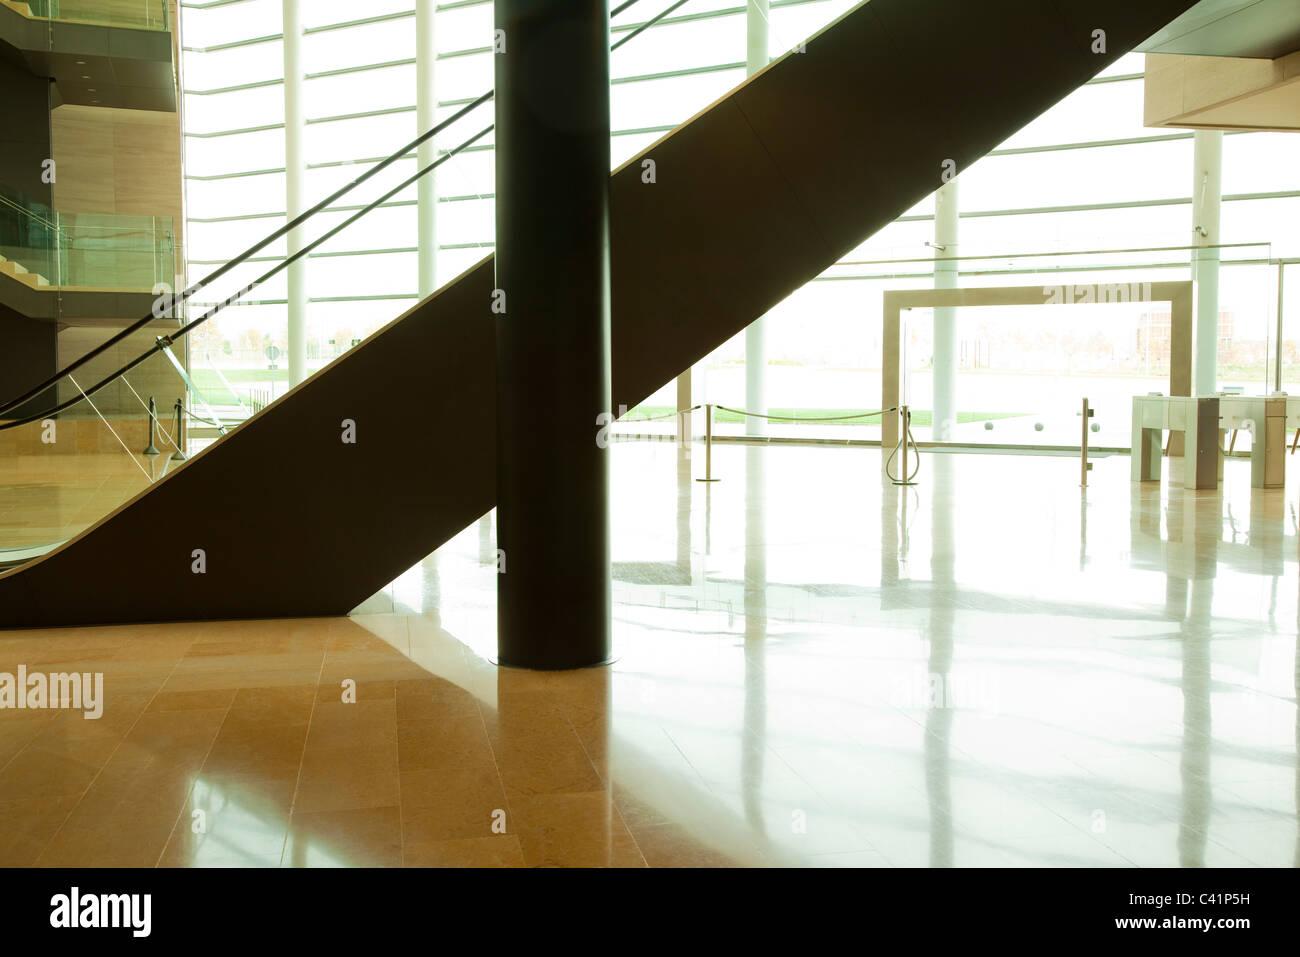 Escalator in lobby - Stock Image